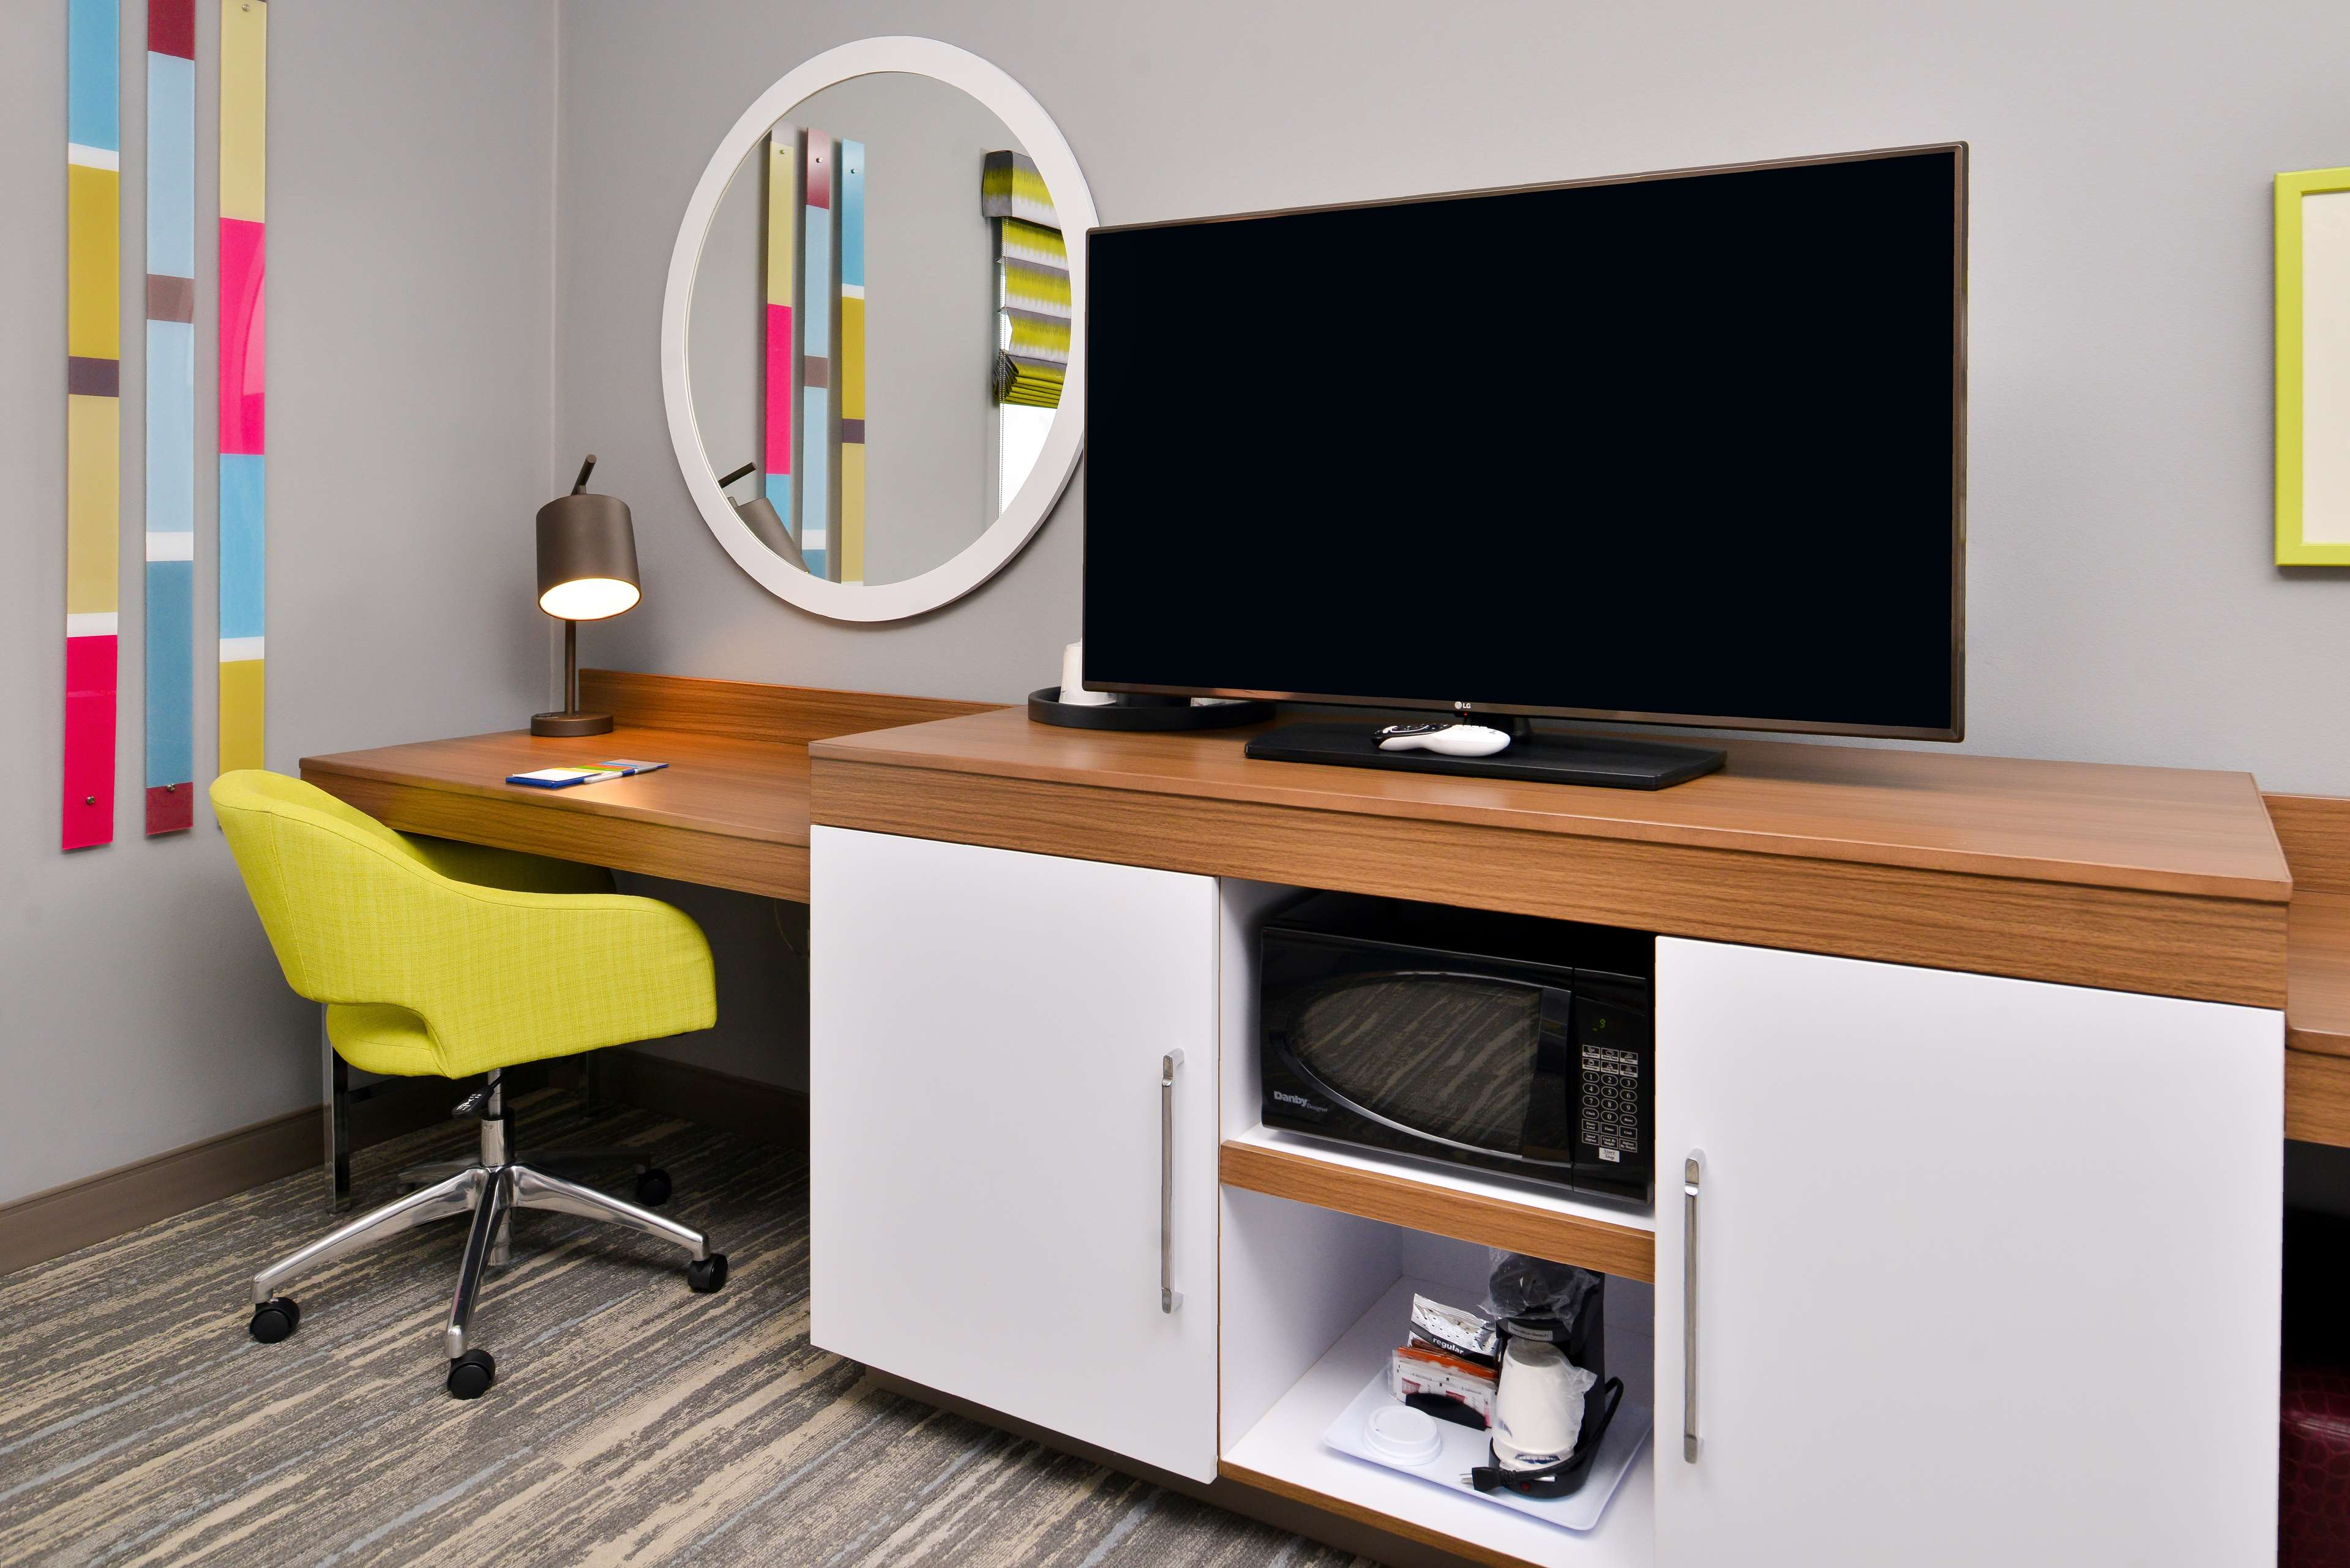 Hampton Inn & Suites St. Paul Oakdale/Woodbury image 25